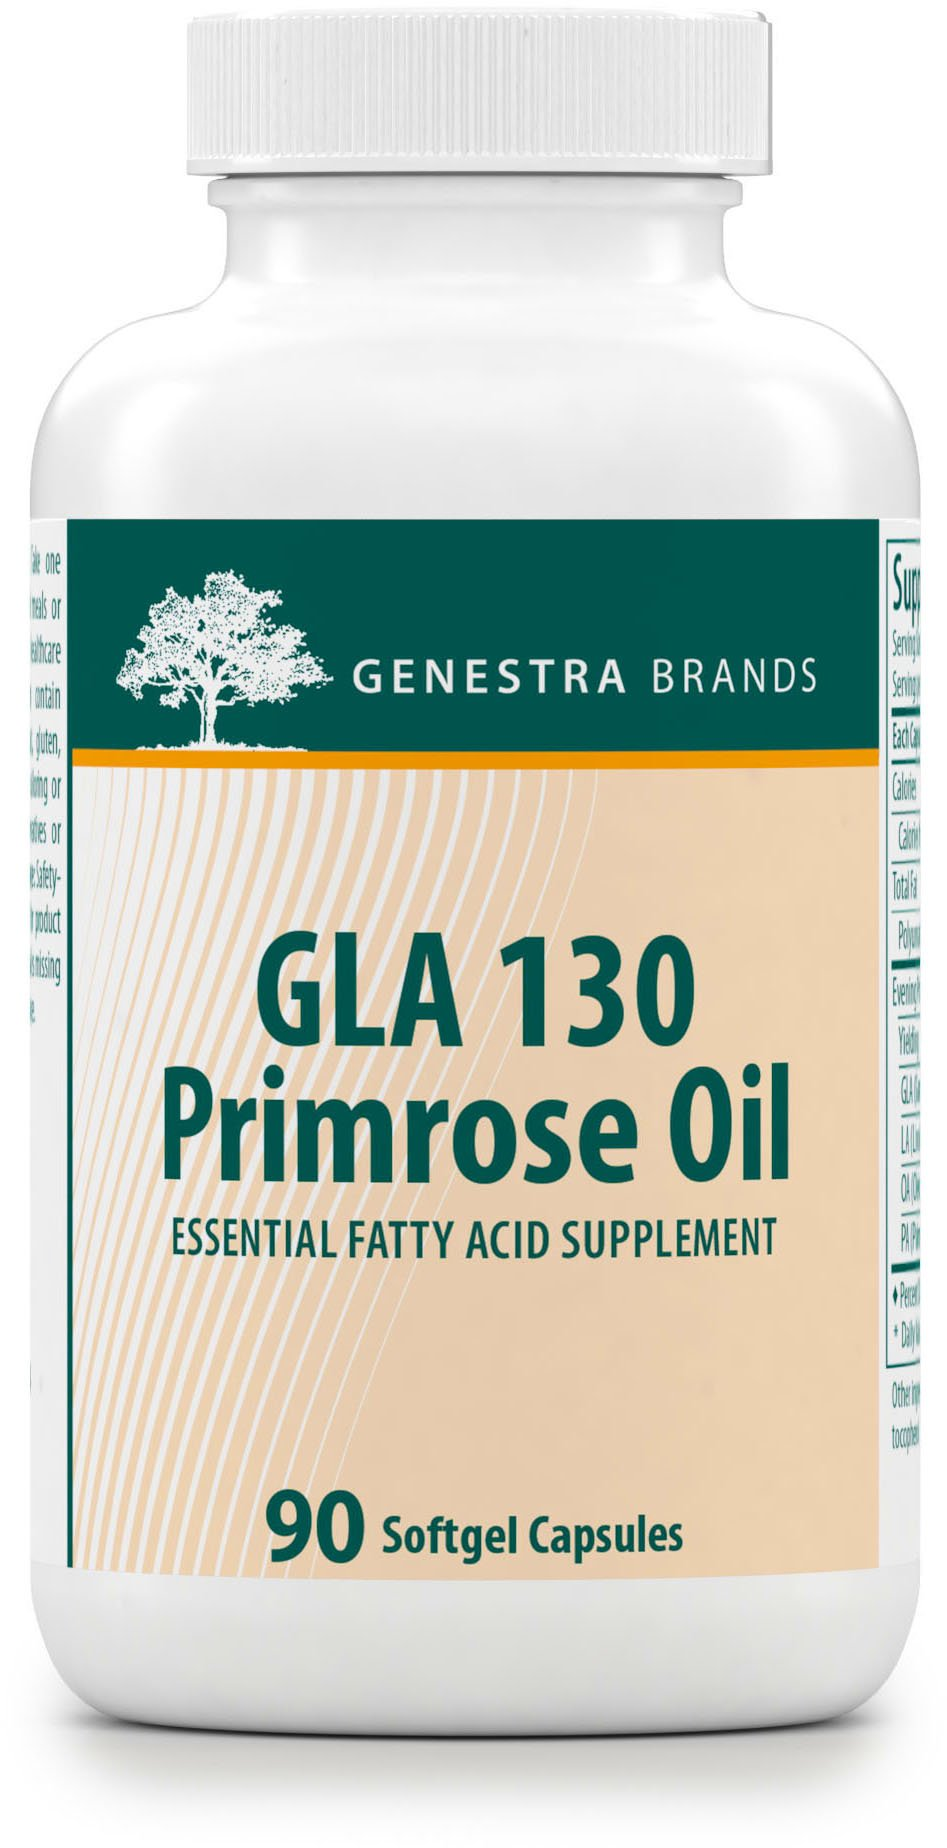 Genestra Brands - GLA 130 Primrose Oil - Essential Fatty Acid Formula - 90 Softgel Capsules